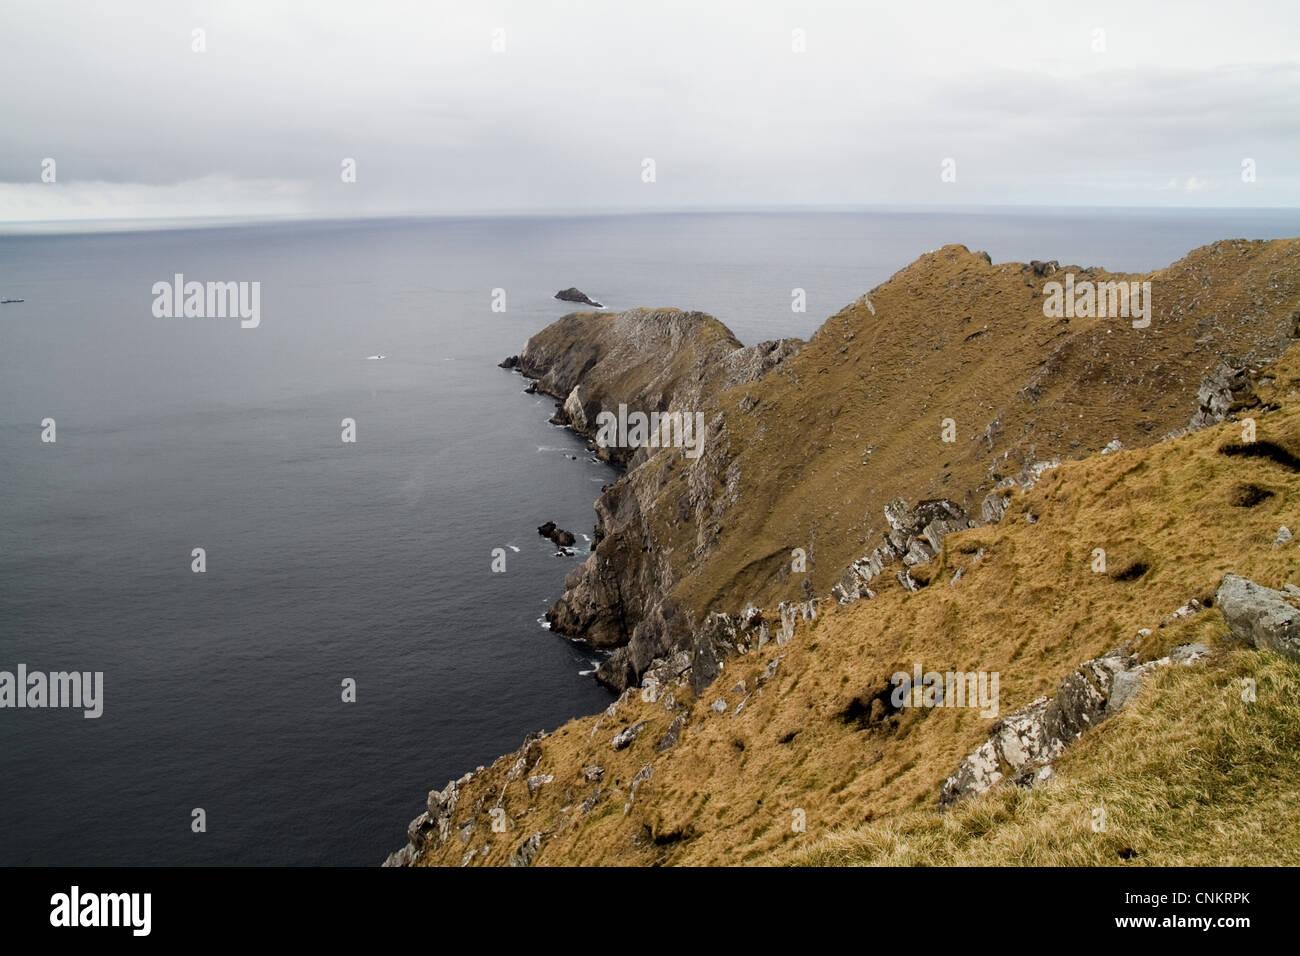 Sea cliffs at Achill Head, Mayo, Ireland - Stock Image